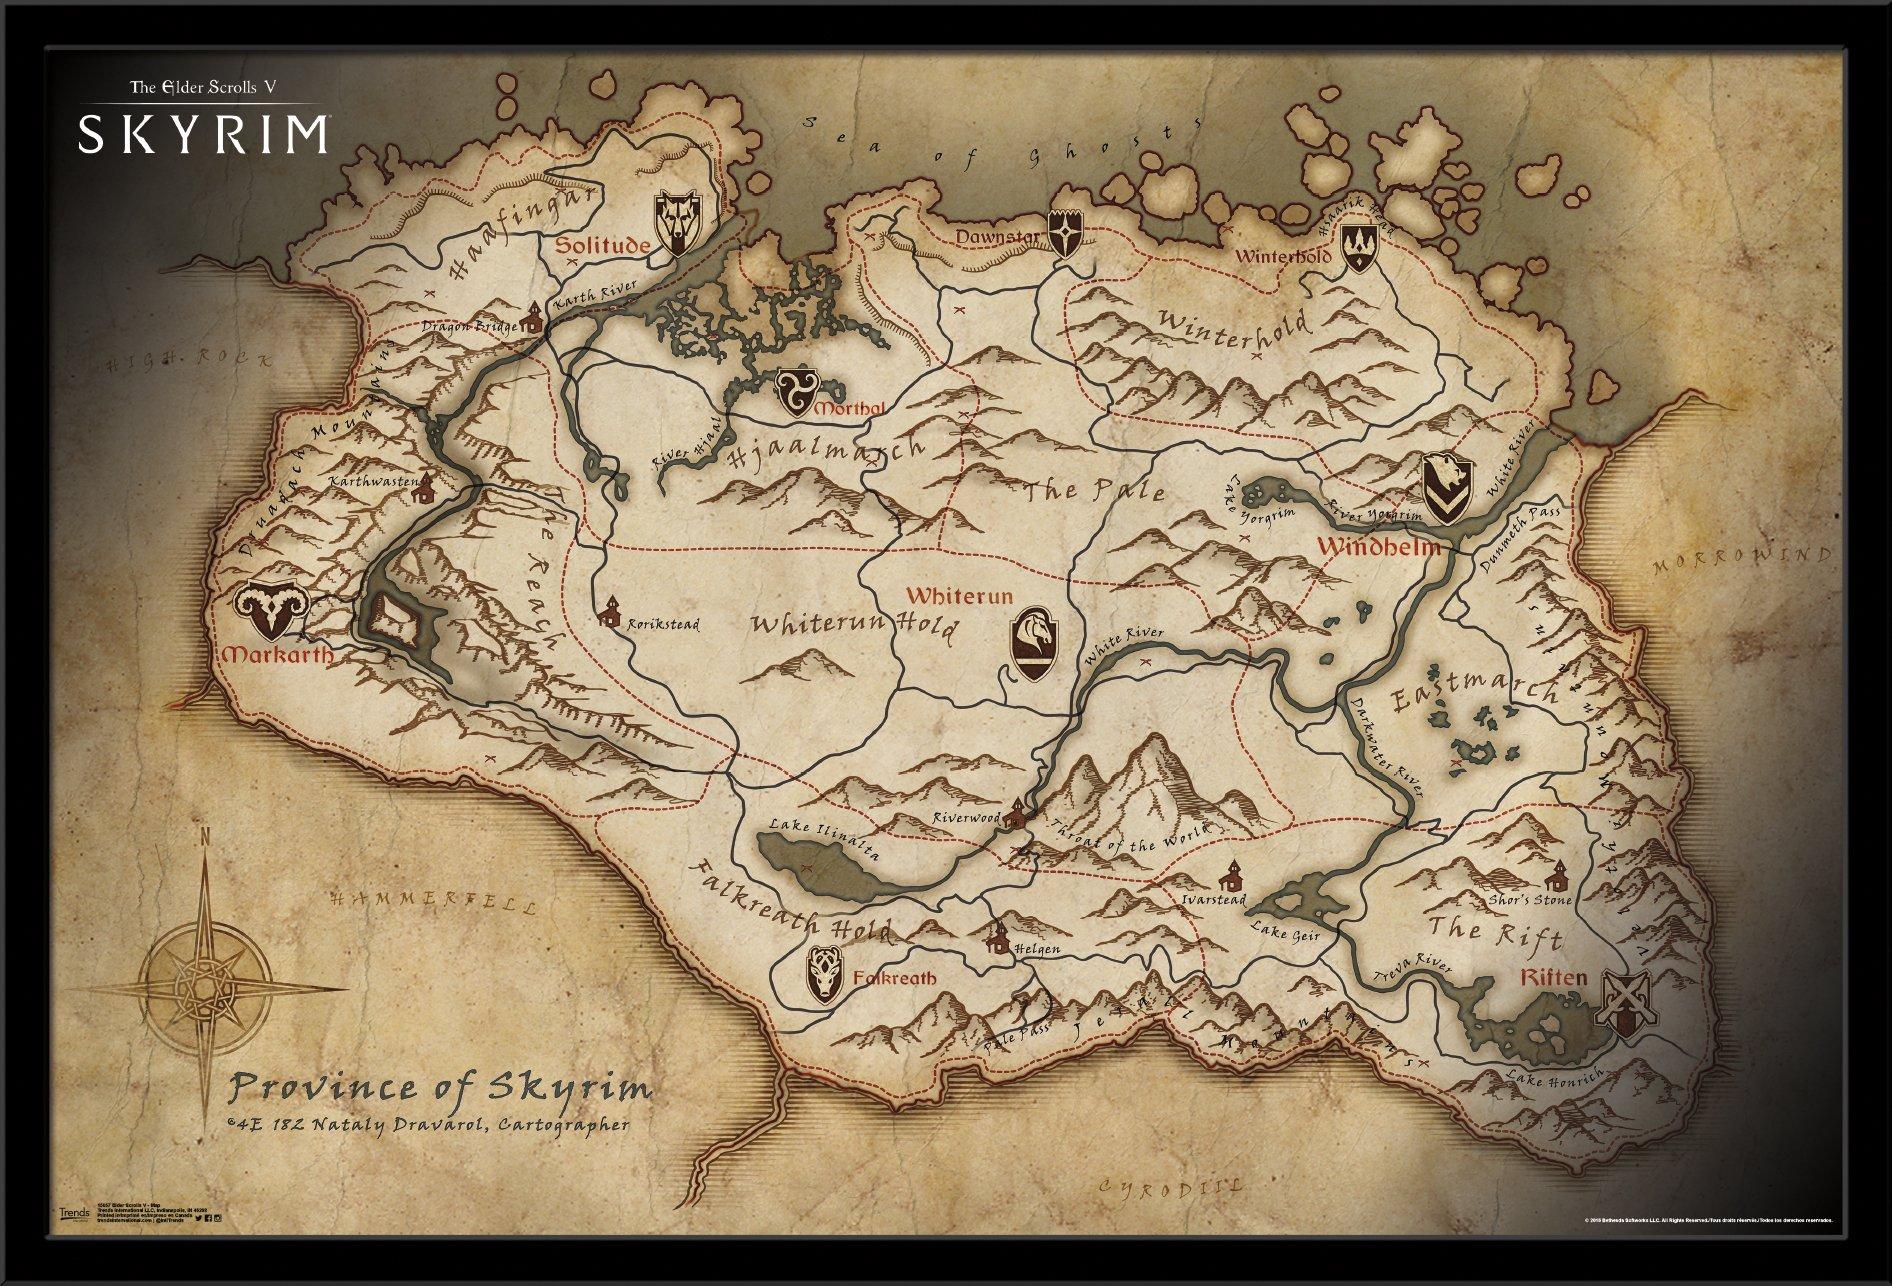 Trends International Elder Scrolls Skyrim Map Mounted Poster 22.375'' x 34'' by Trends International